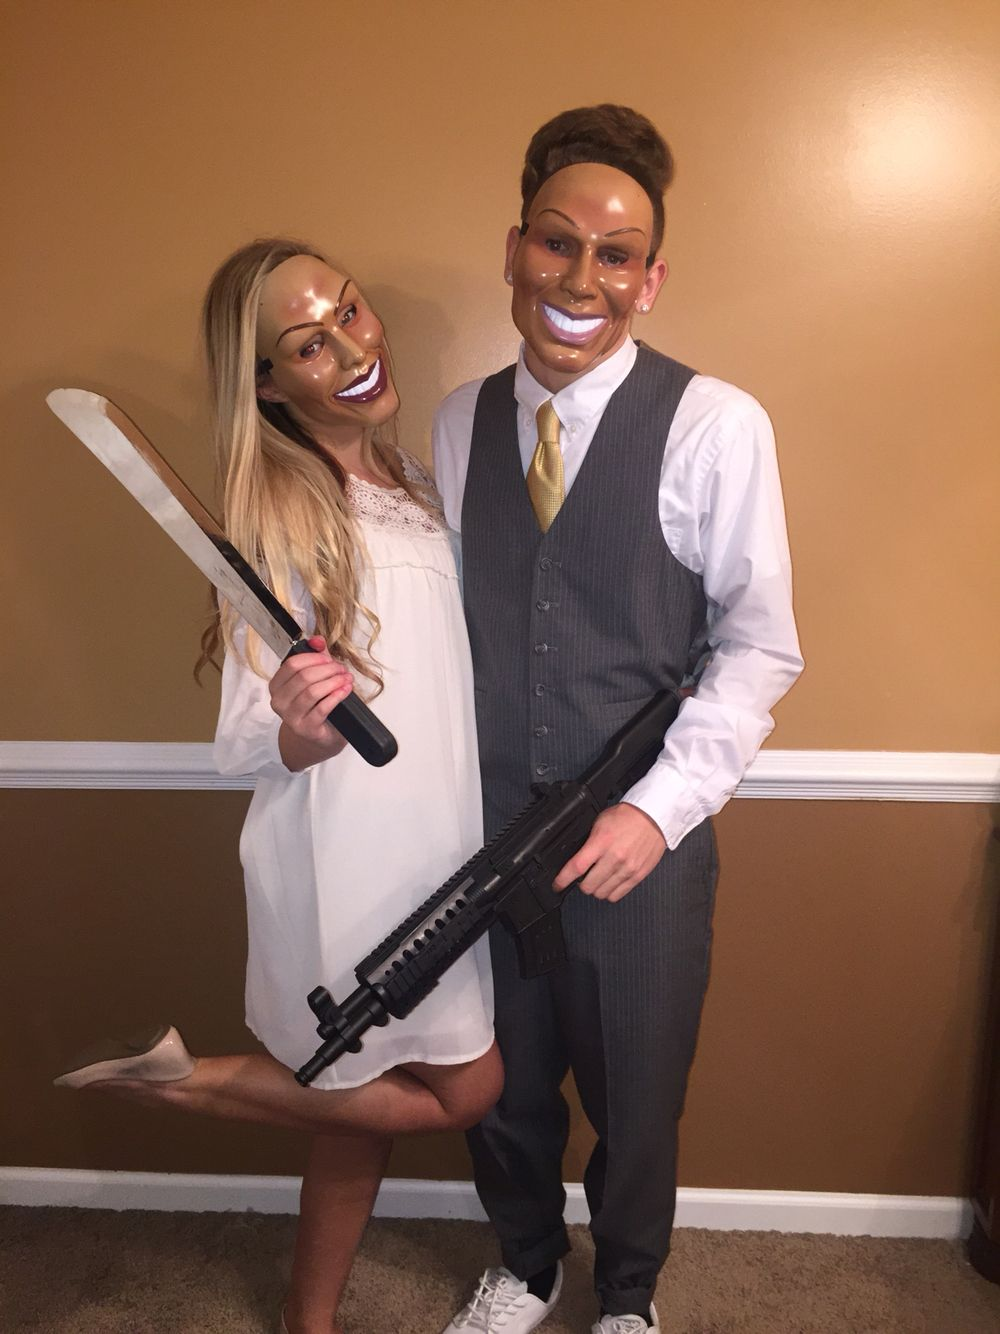 The Purge couple costume #thepurge #couplecostume @ryliston ...